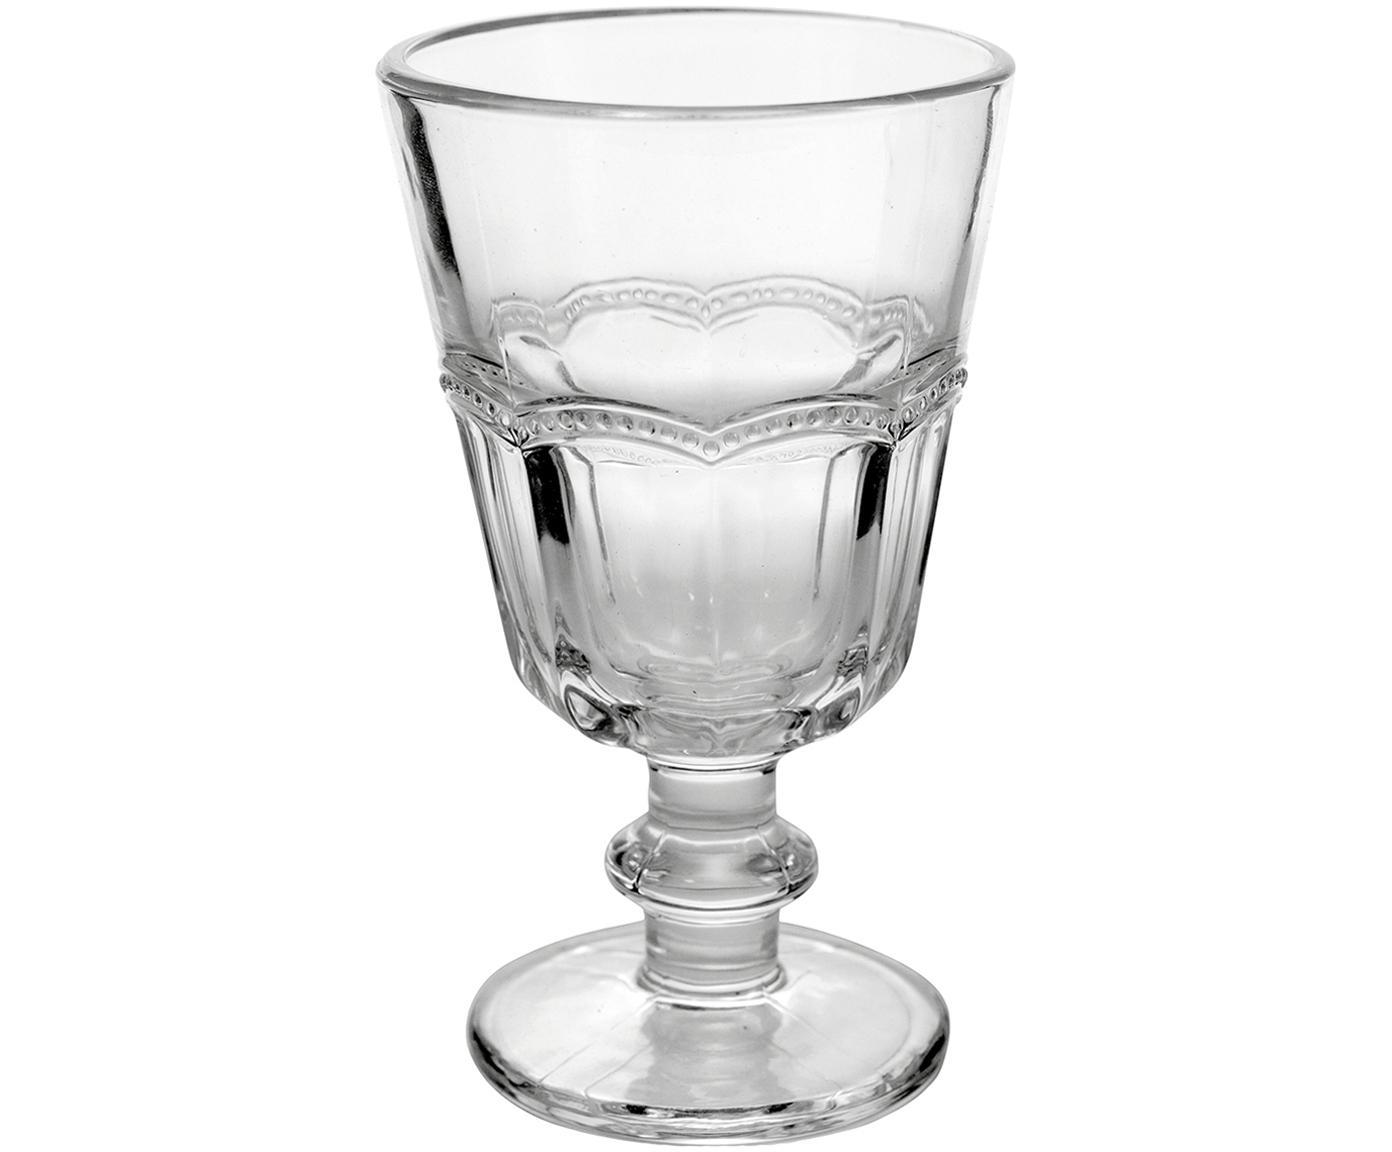 Wijnglazen Floyd met gespiegeld reliëf, 6-delig, Glas, Transparant, Ø 9 x H 14 cm